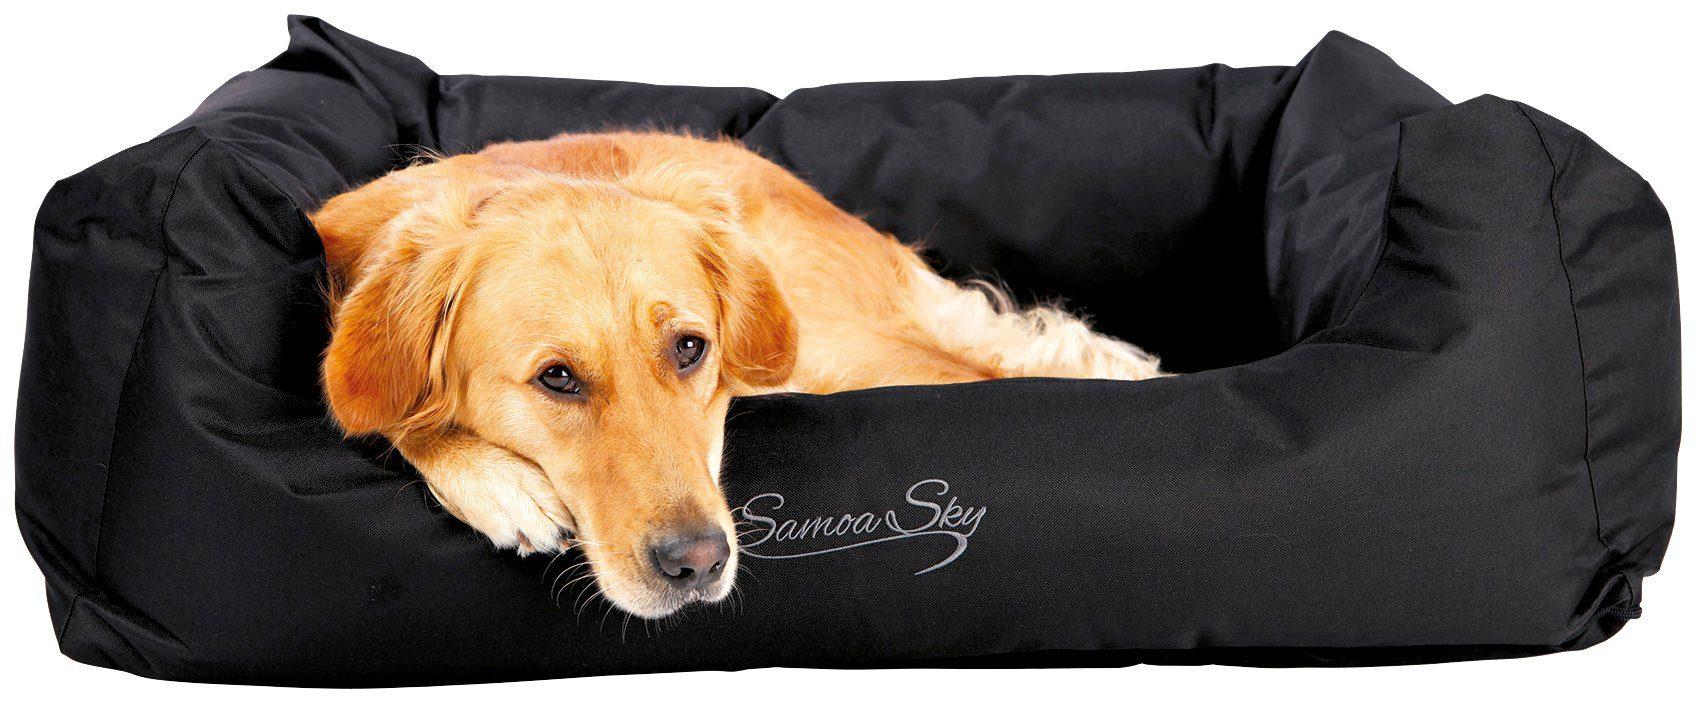 Hunde-Bett »Samoa Sky«, BxL: 120x105 cm, schwarz